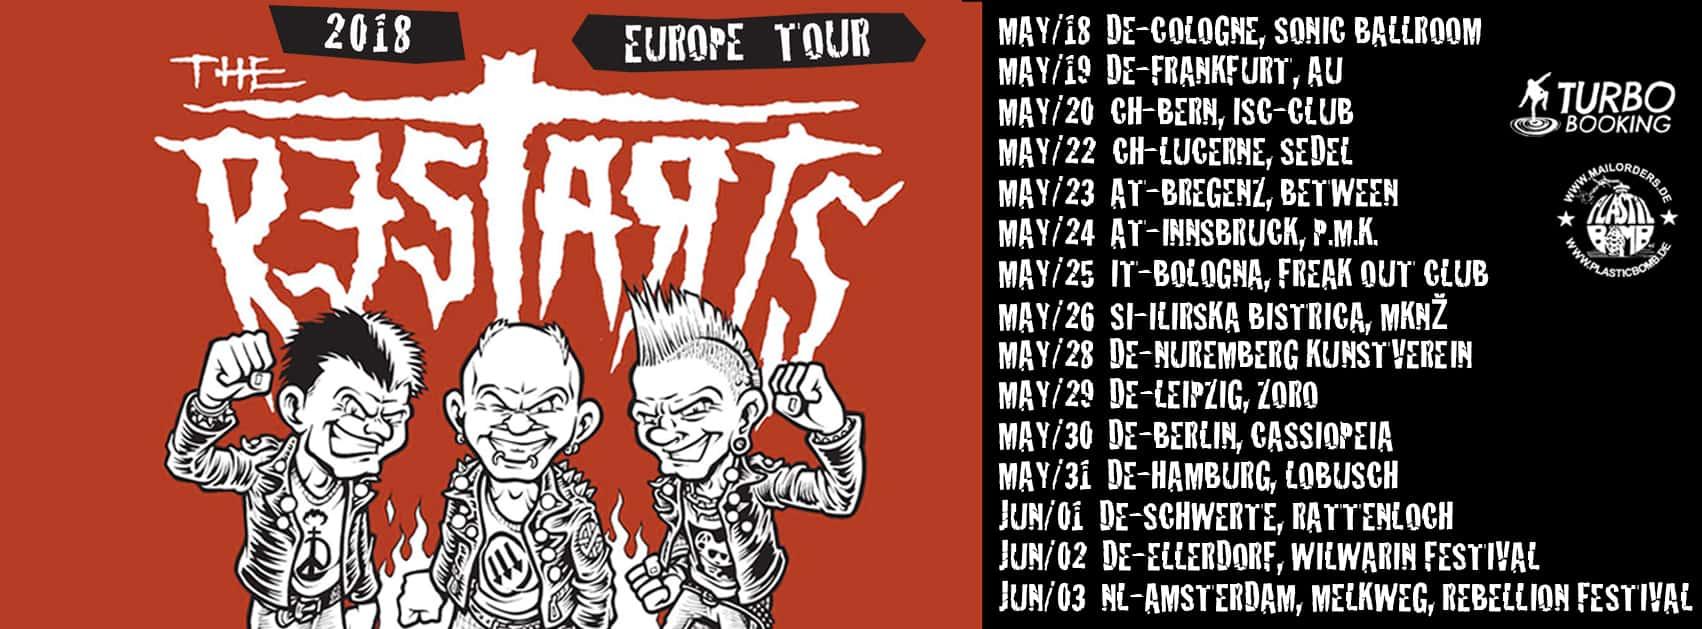 Restarts Tour 2018